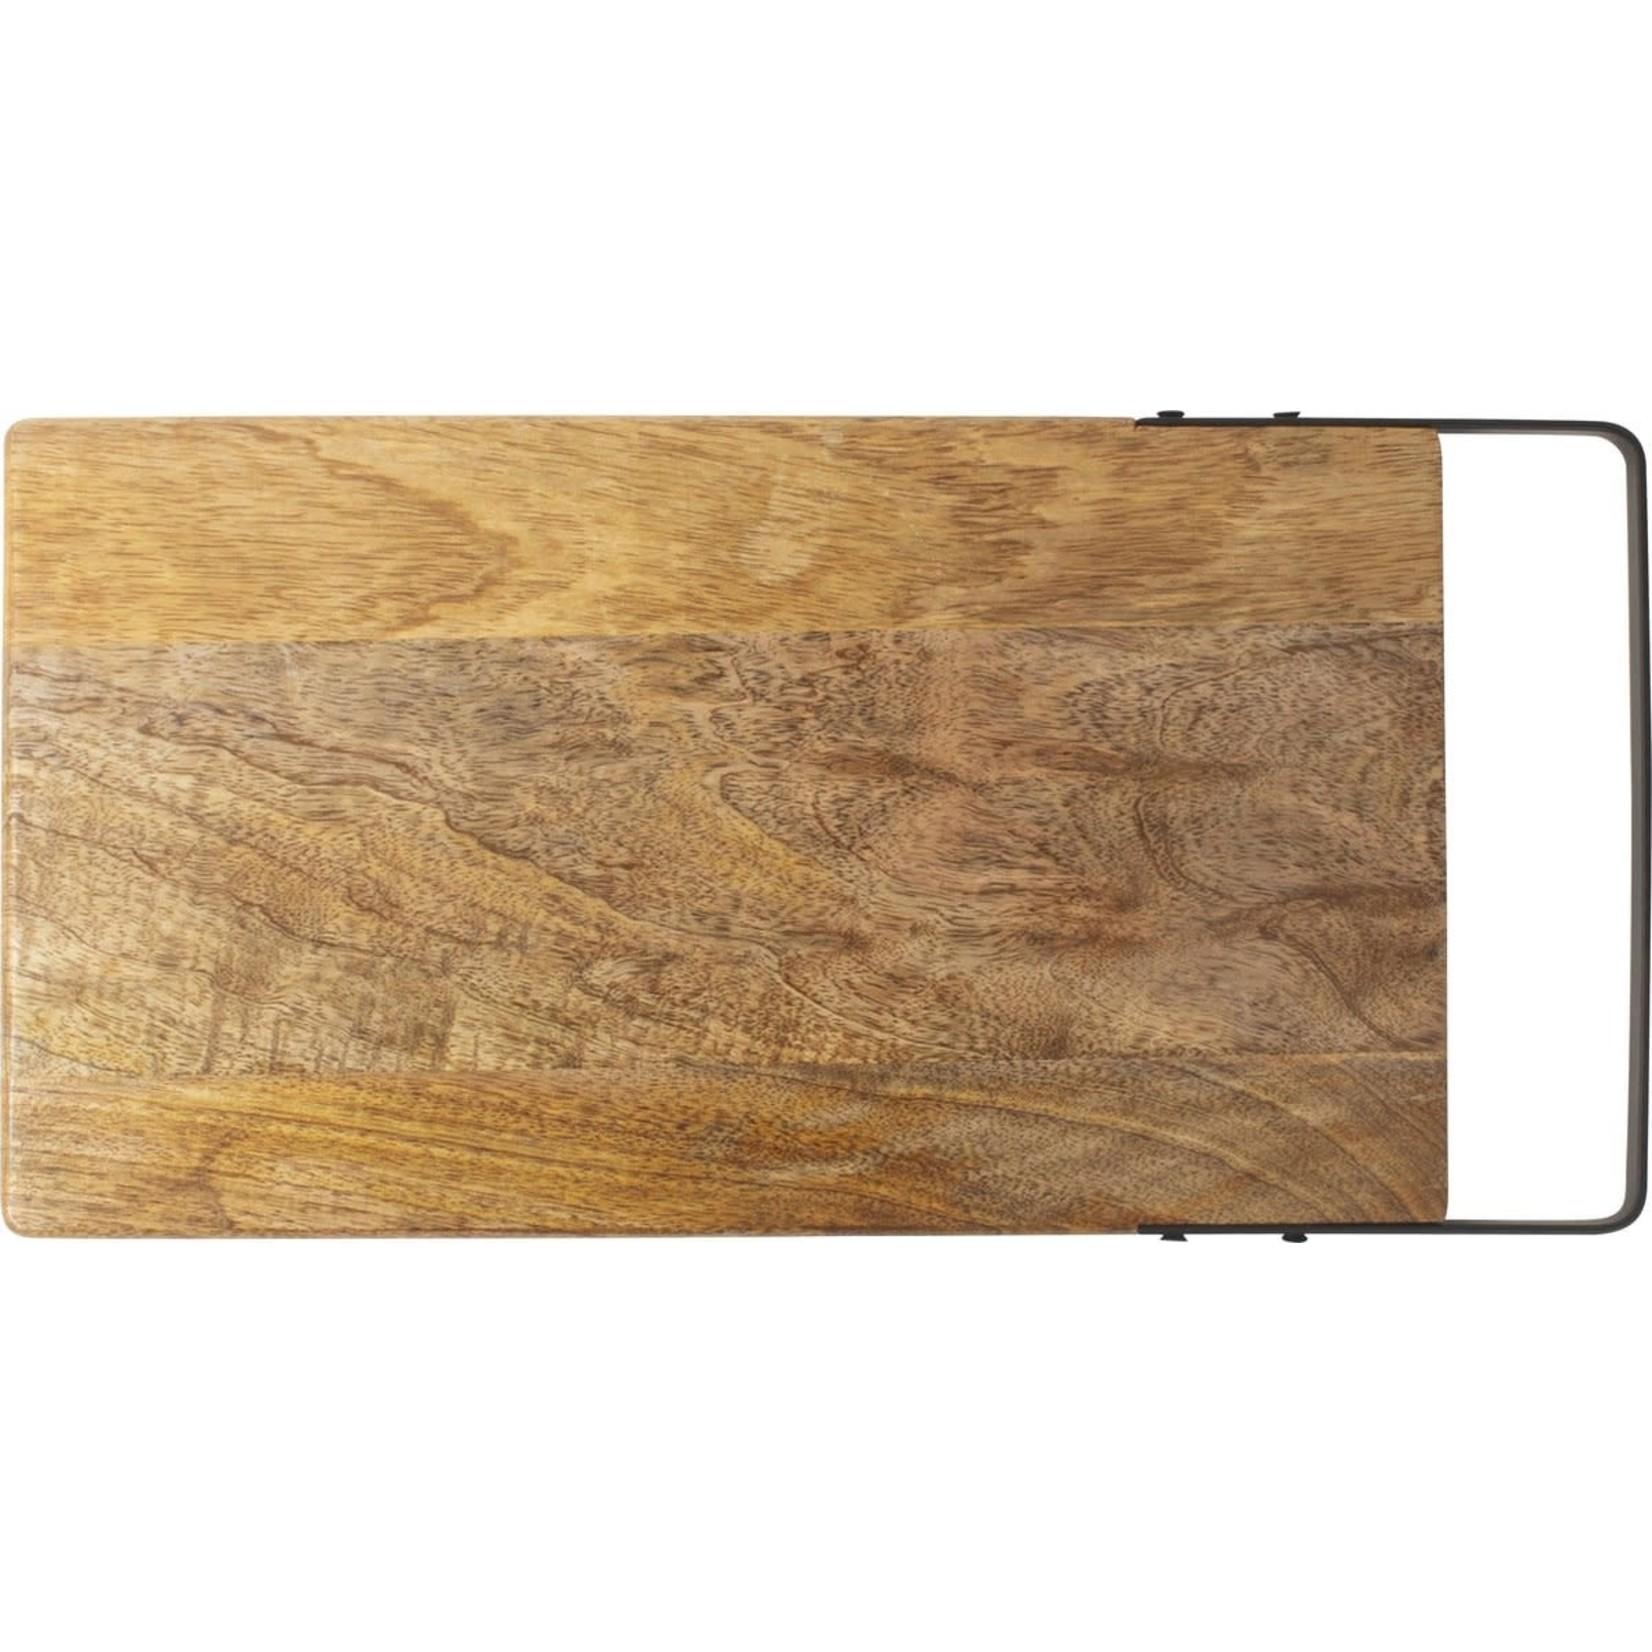 Gusta Serveerplank 40x20cm